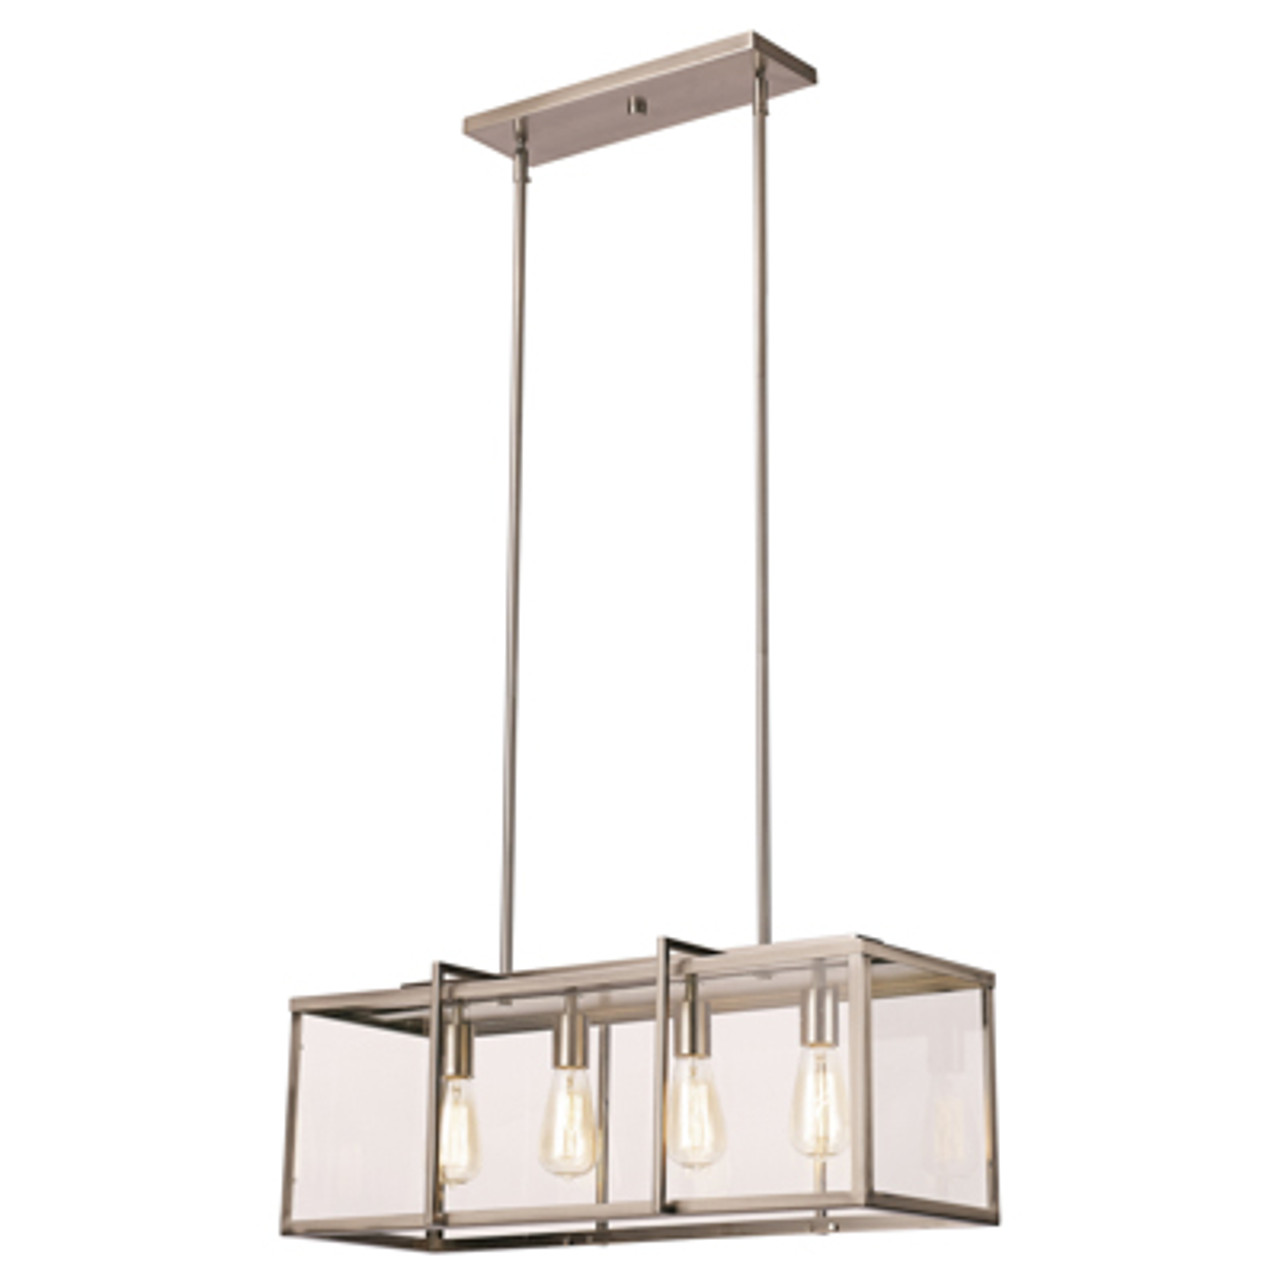 Trans Globe Lighting 10213 Bn 12 Indoor Brushed Nickel Industrial Pendant At Clw Lighting